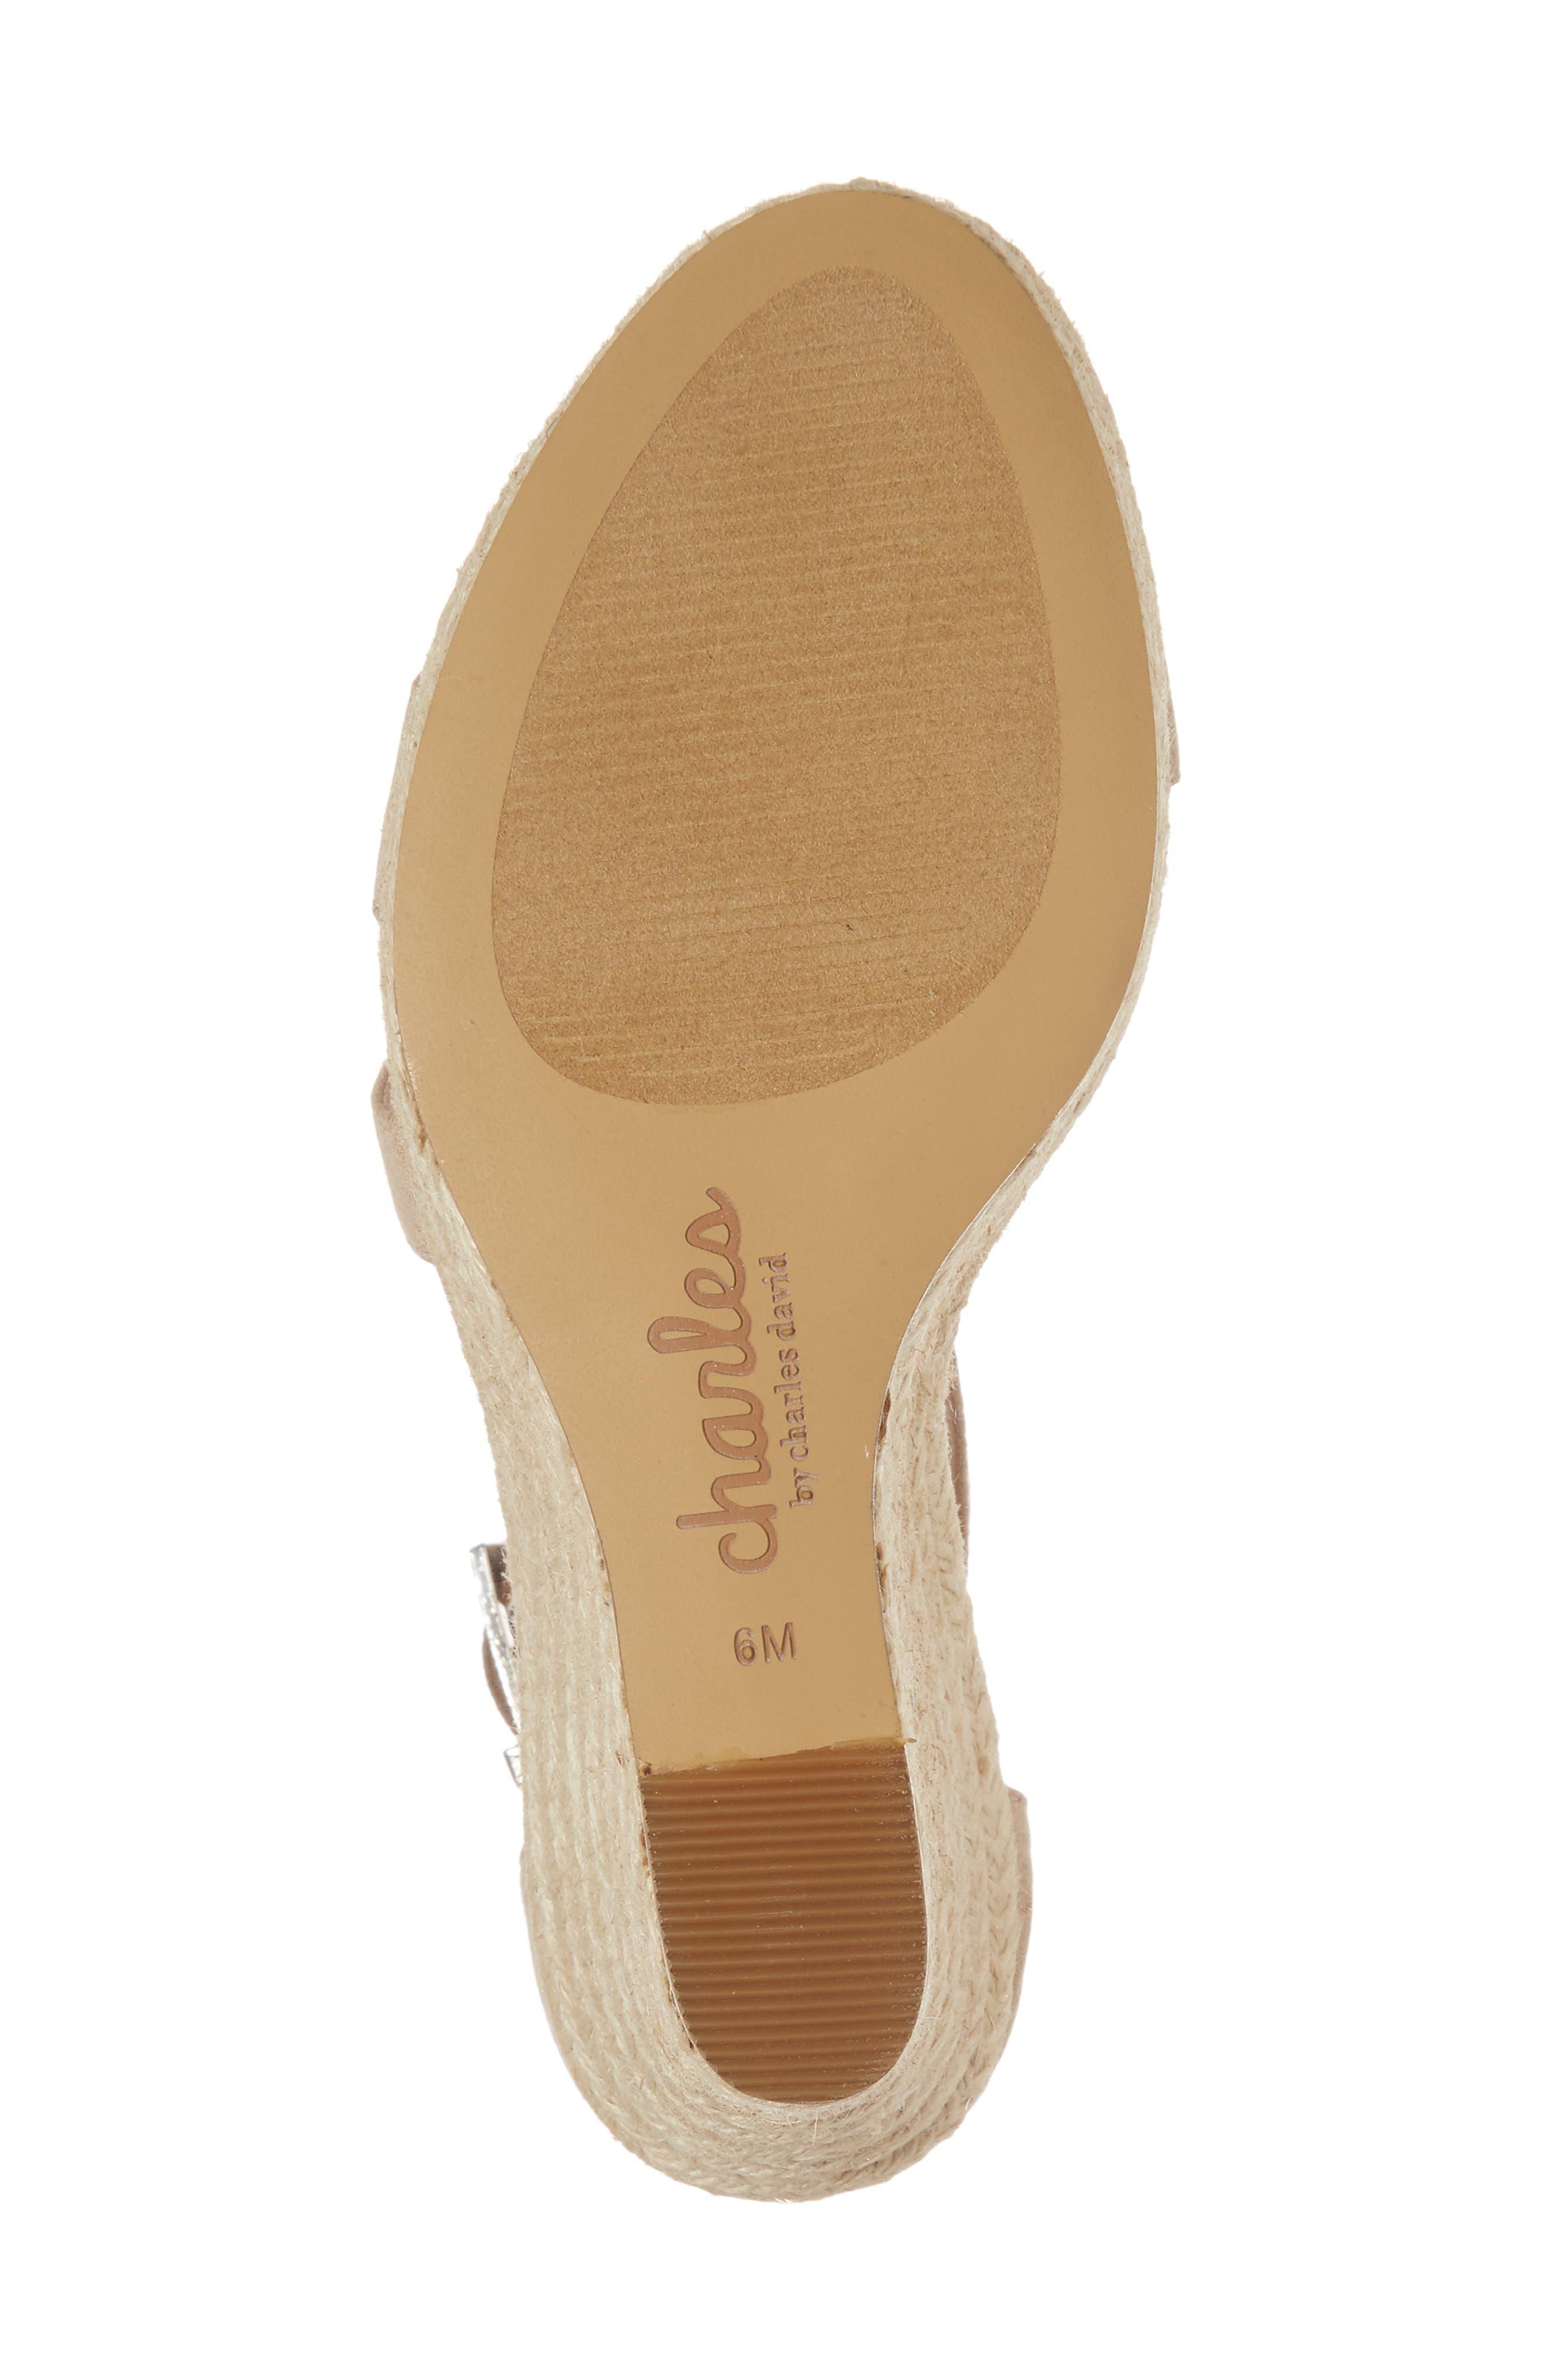 Lou Asymmetrical Wedge Sandal,                             Alternate thumbnail 6, color,                             Nude Suede